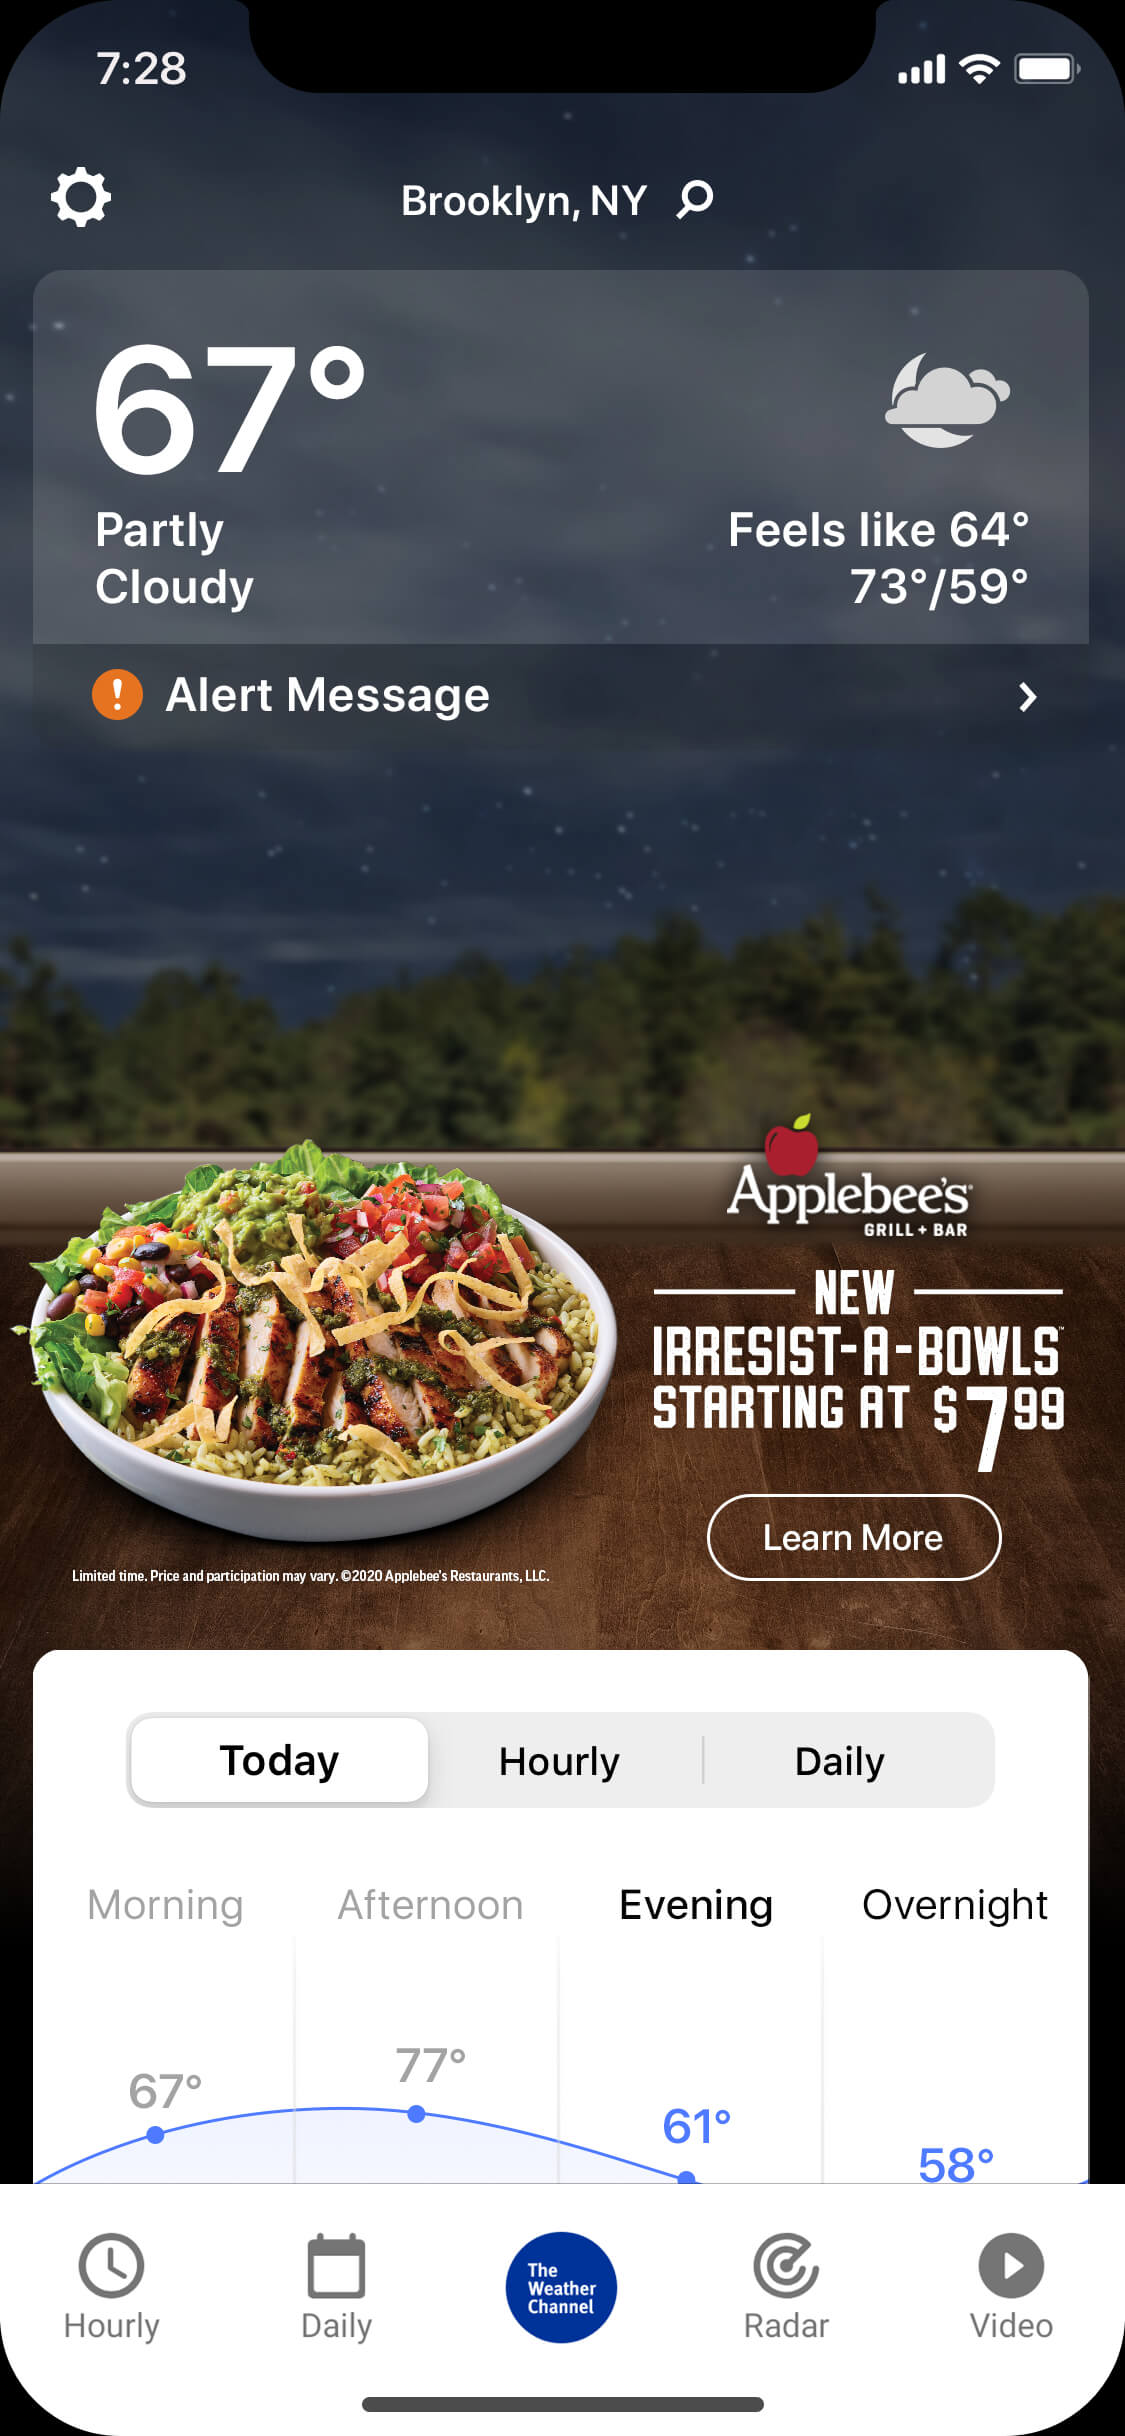 applebees-bowls-im_cloudy-night